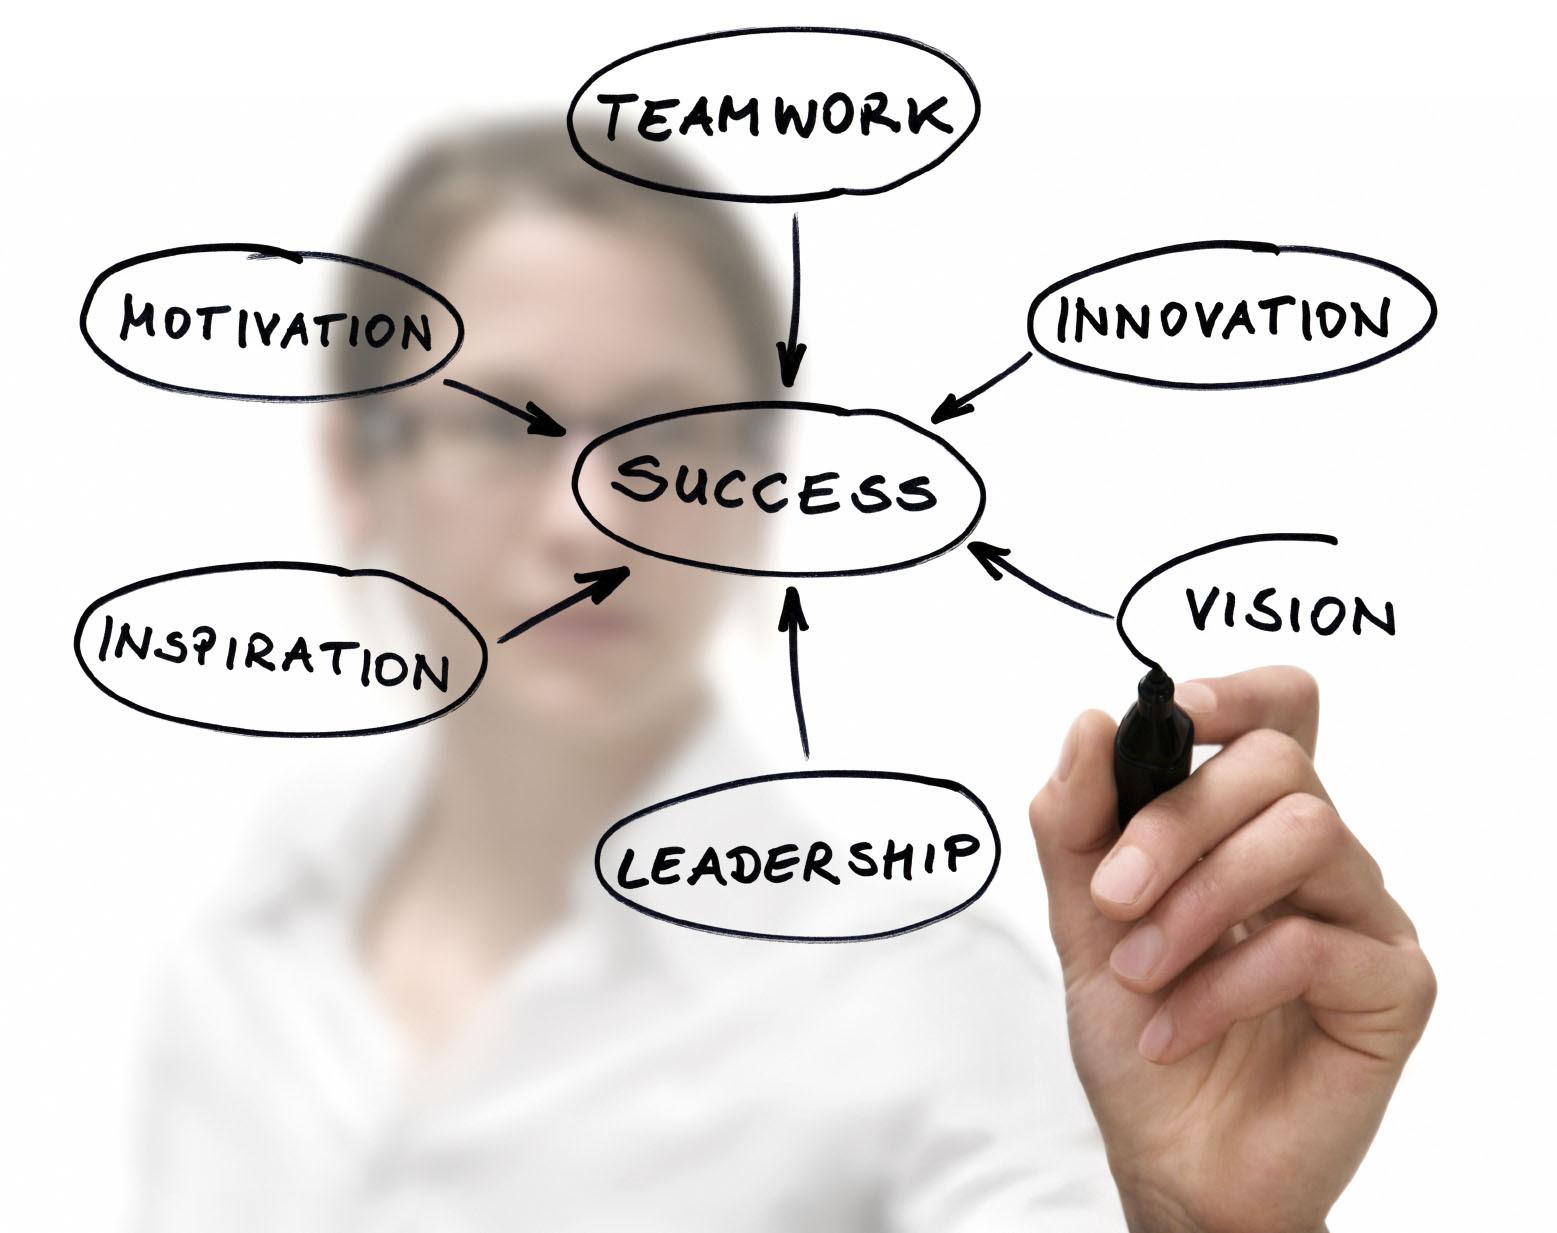 http://www.thepartneringgroup.com/wp-content/uploads/2012/05/171i-Training-Talet-Development-Competency-Benchmarking.jpg